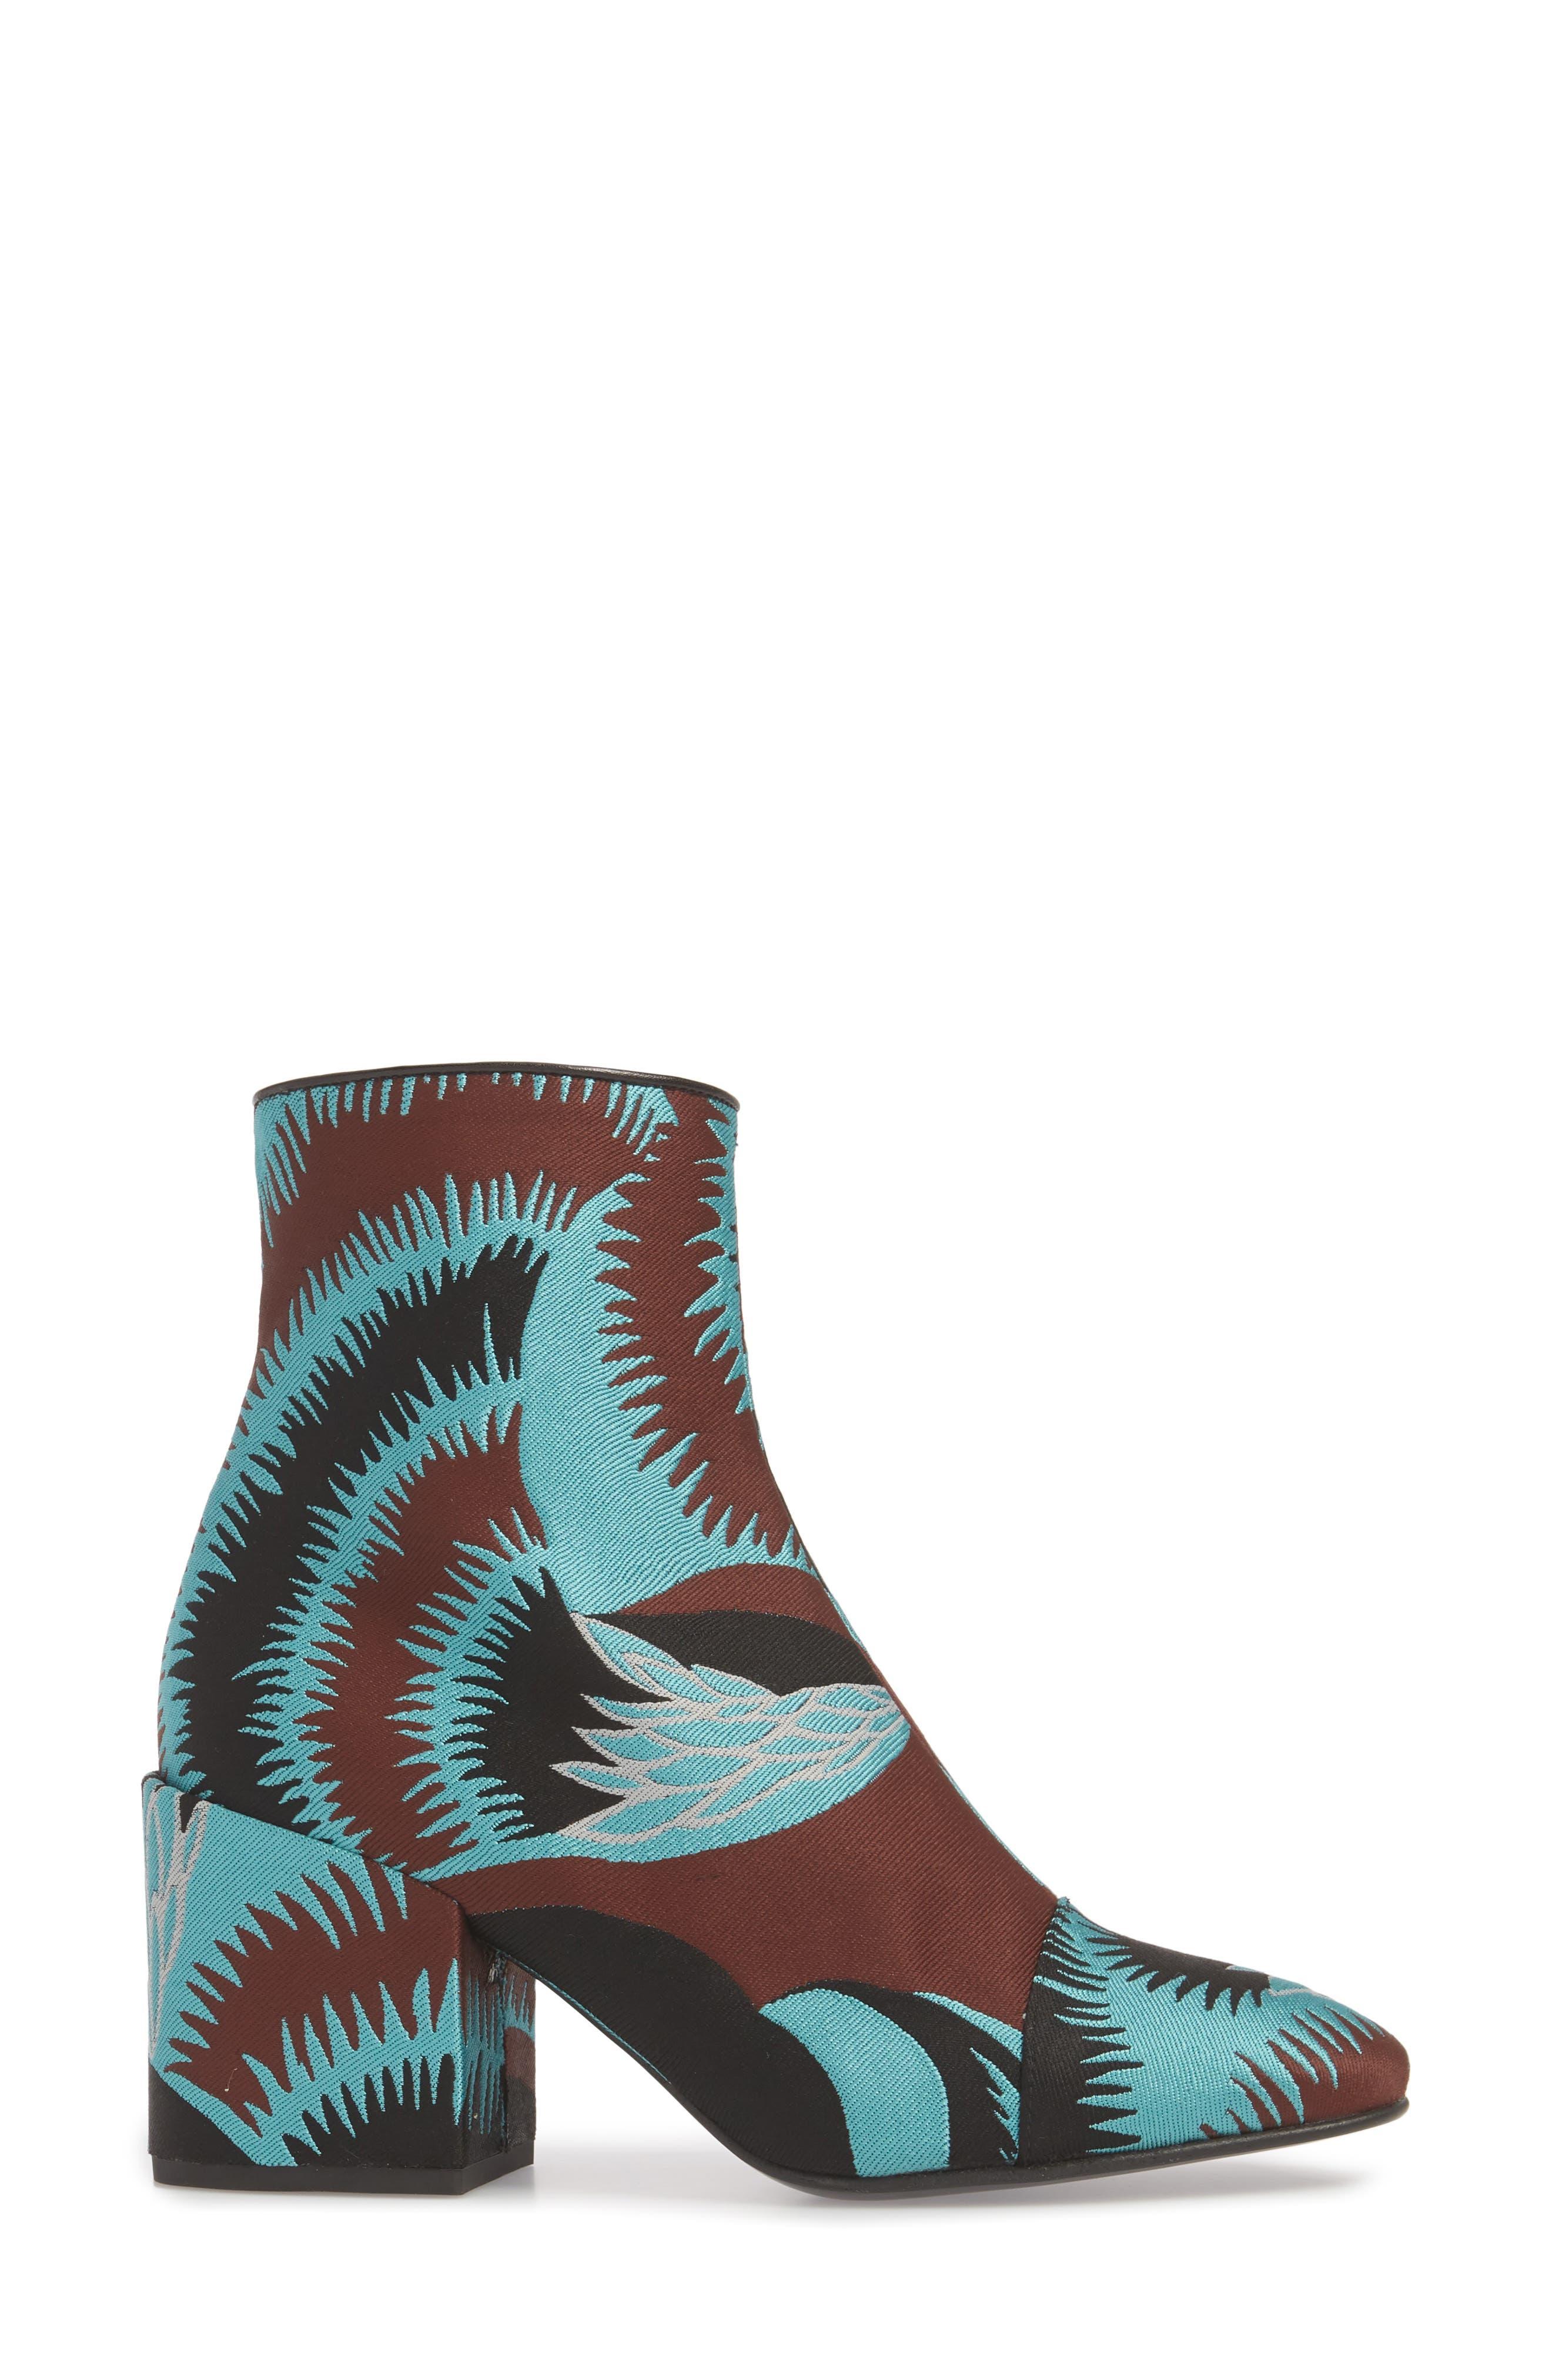 Print Block Heel Bootie,                             Alternate thumbnail 3, color,                             Turquoise